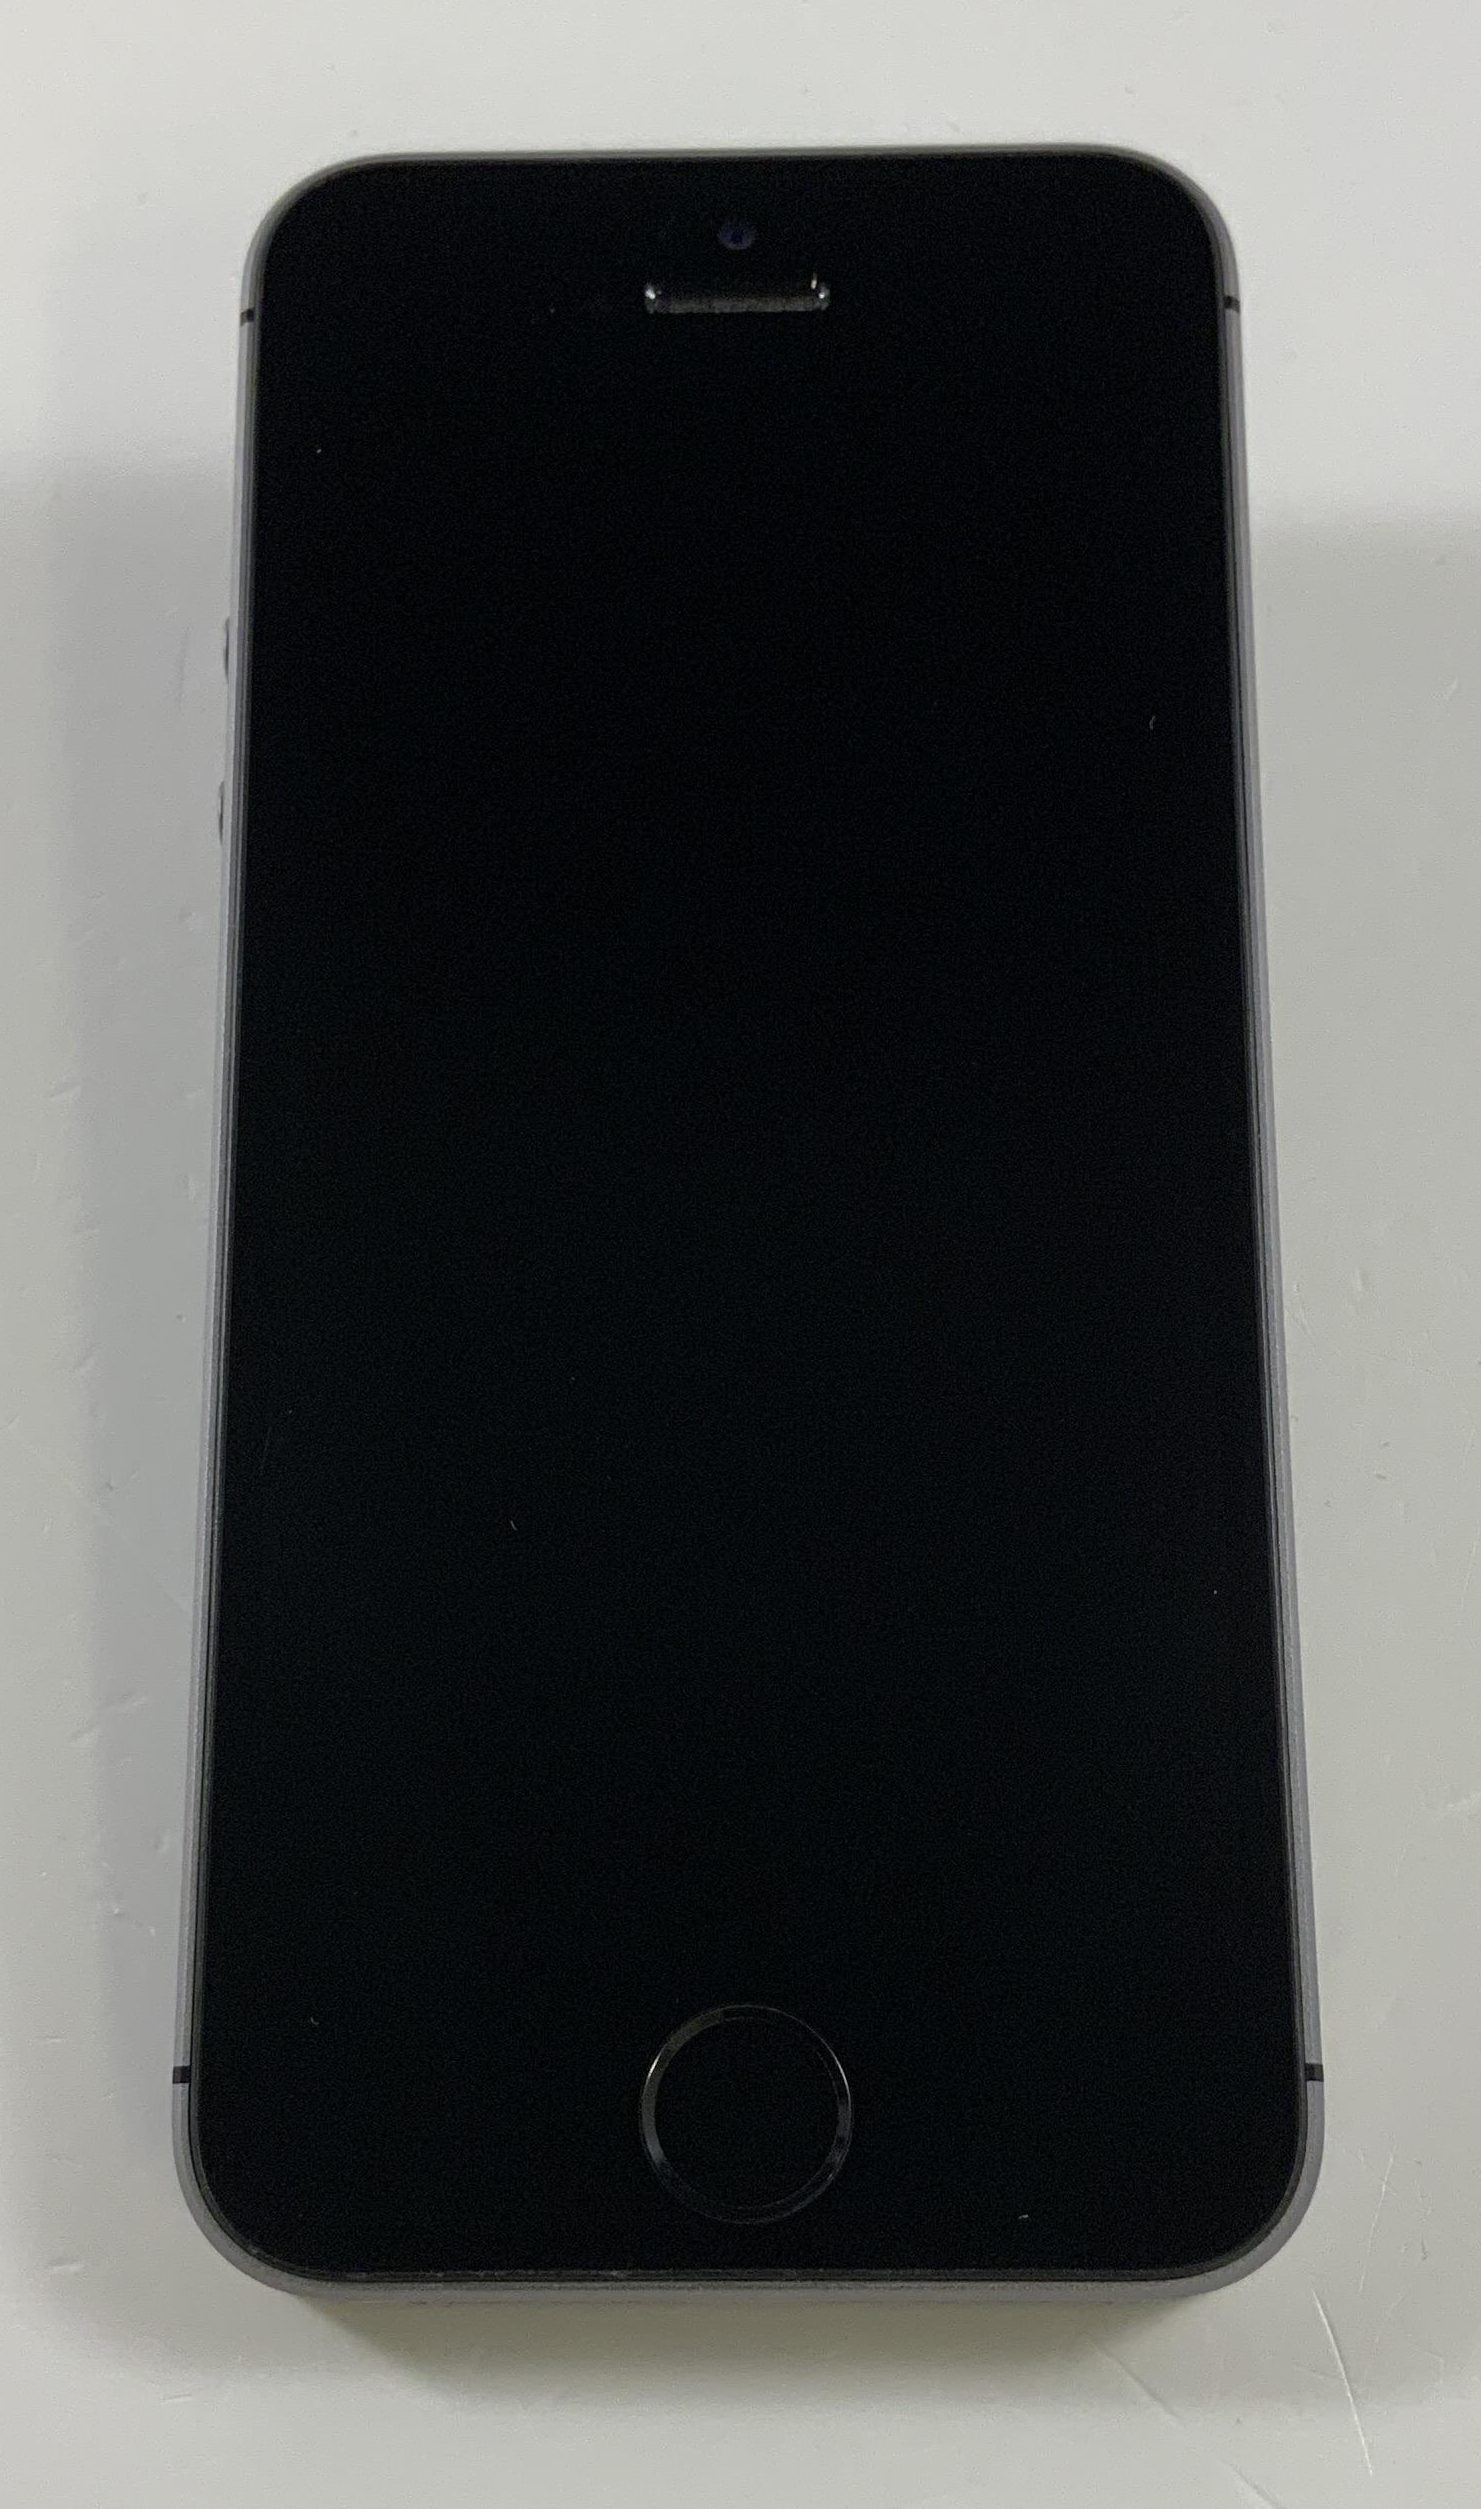 iPhone SE 16GB, 16GB, Space Gray, bild 1